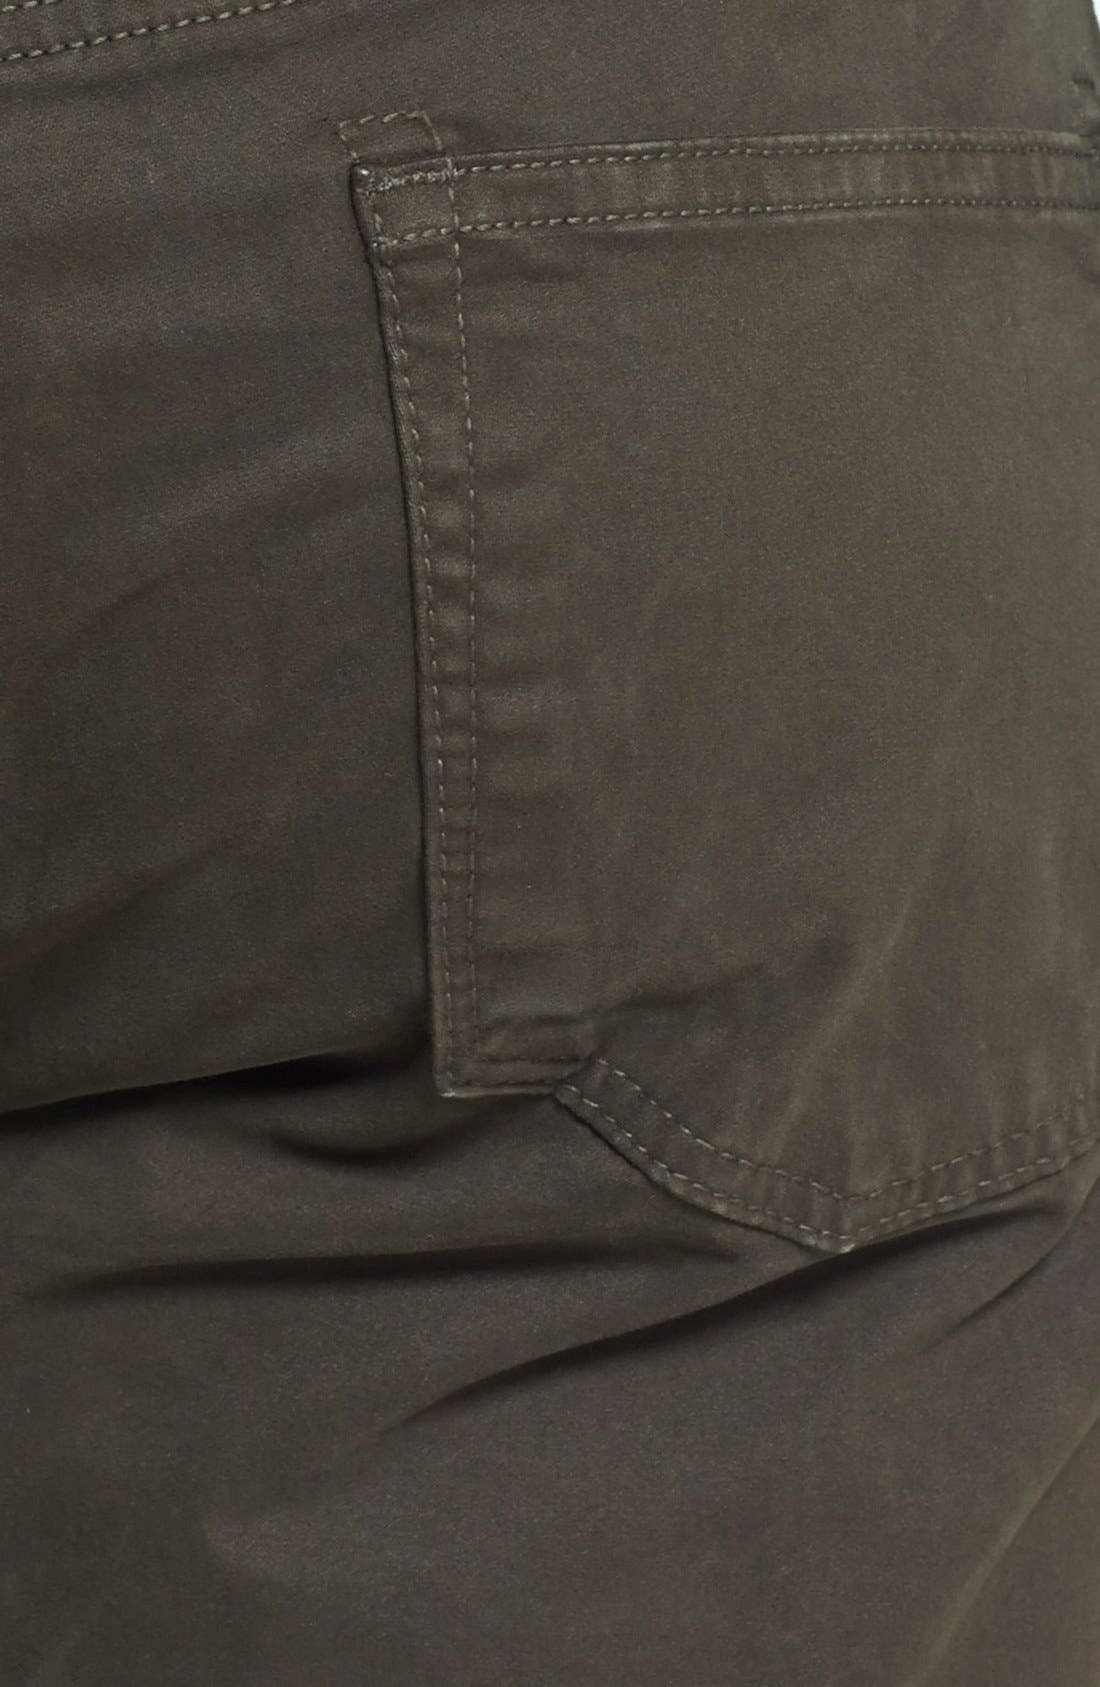 'Kane' Slim Fit Cotton Twill Pants,                             Alternate thumbnail 66, color,